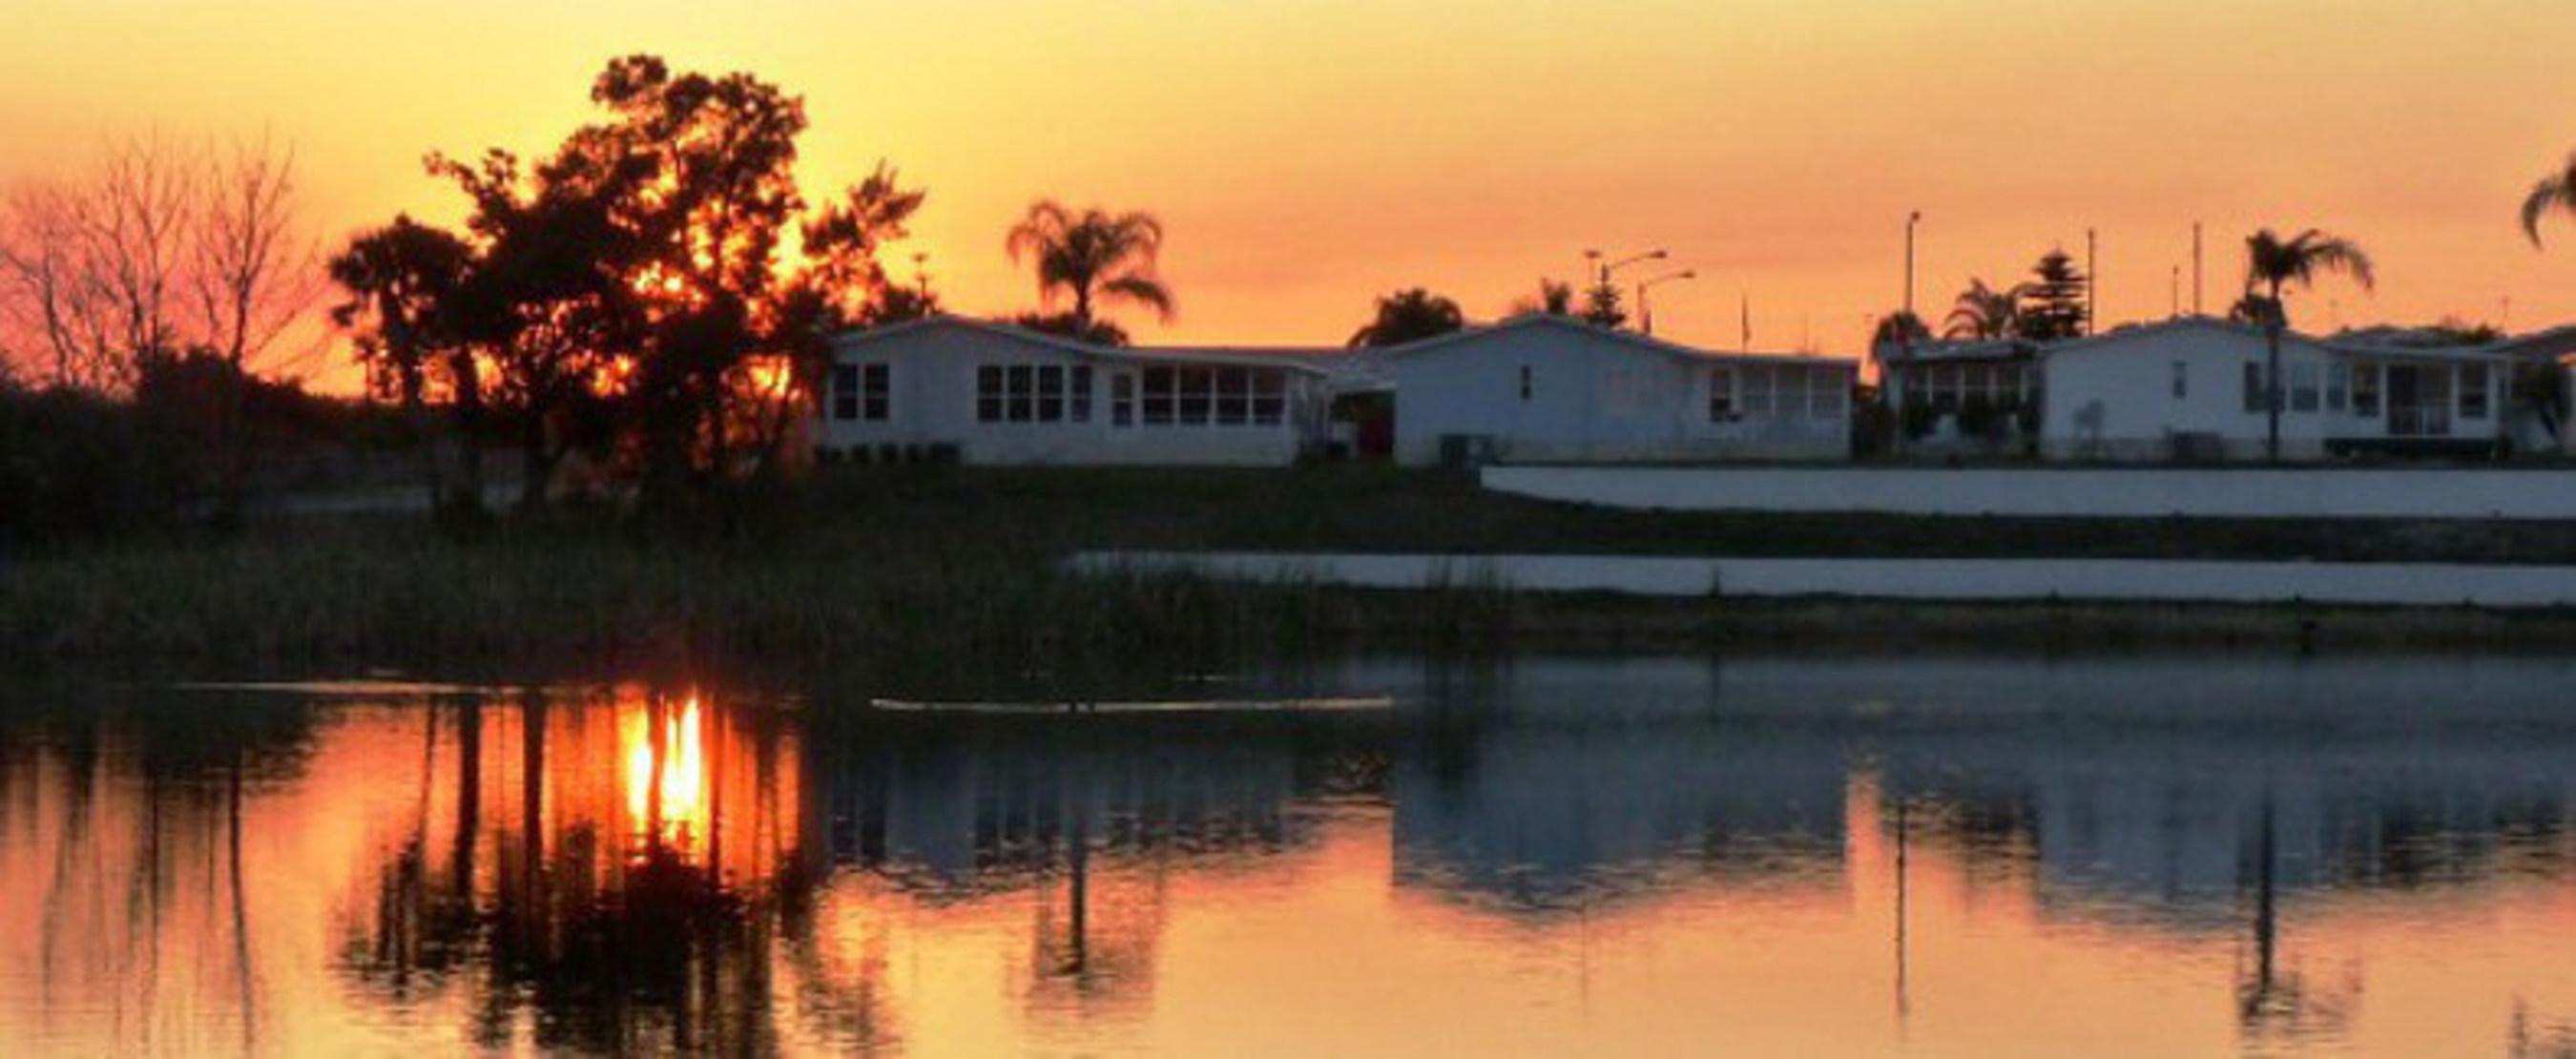 Central Park RV & MH Community - Haines City, Florida.